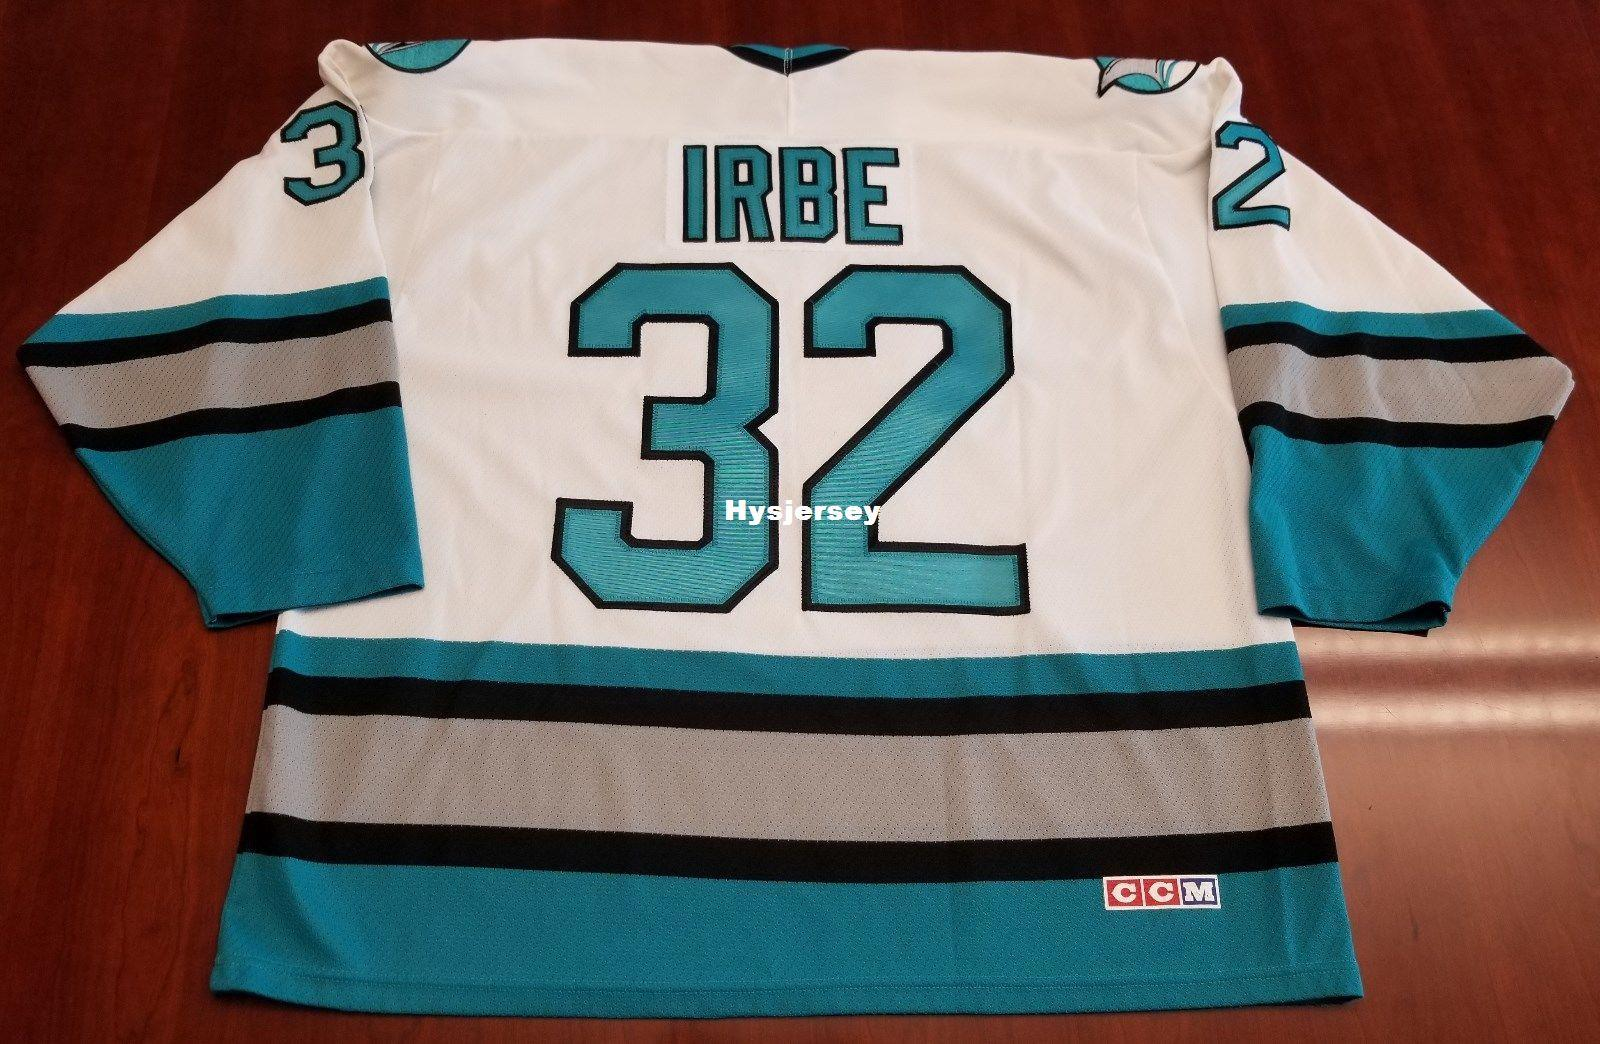 6182a255609 2019 Cheap Arturs Irbe San Jose Sharks Vintage CCM Cheap Hockey Jersey  White Mens Retro Jerseys From Hysjersey, $24.53 | DHgate.Com